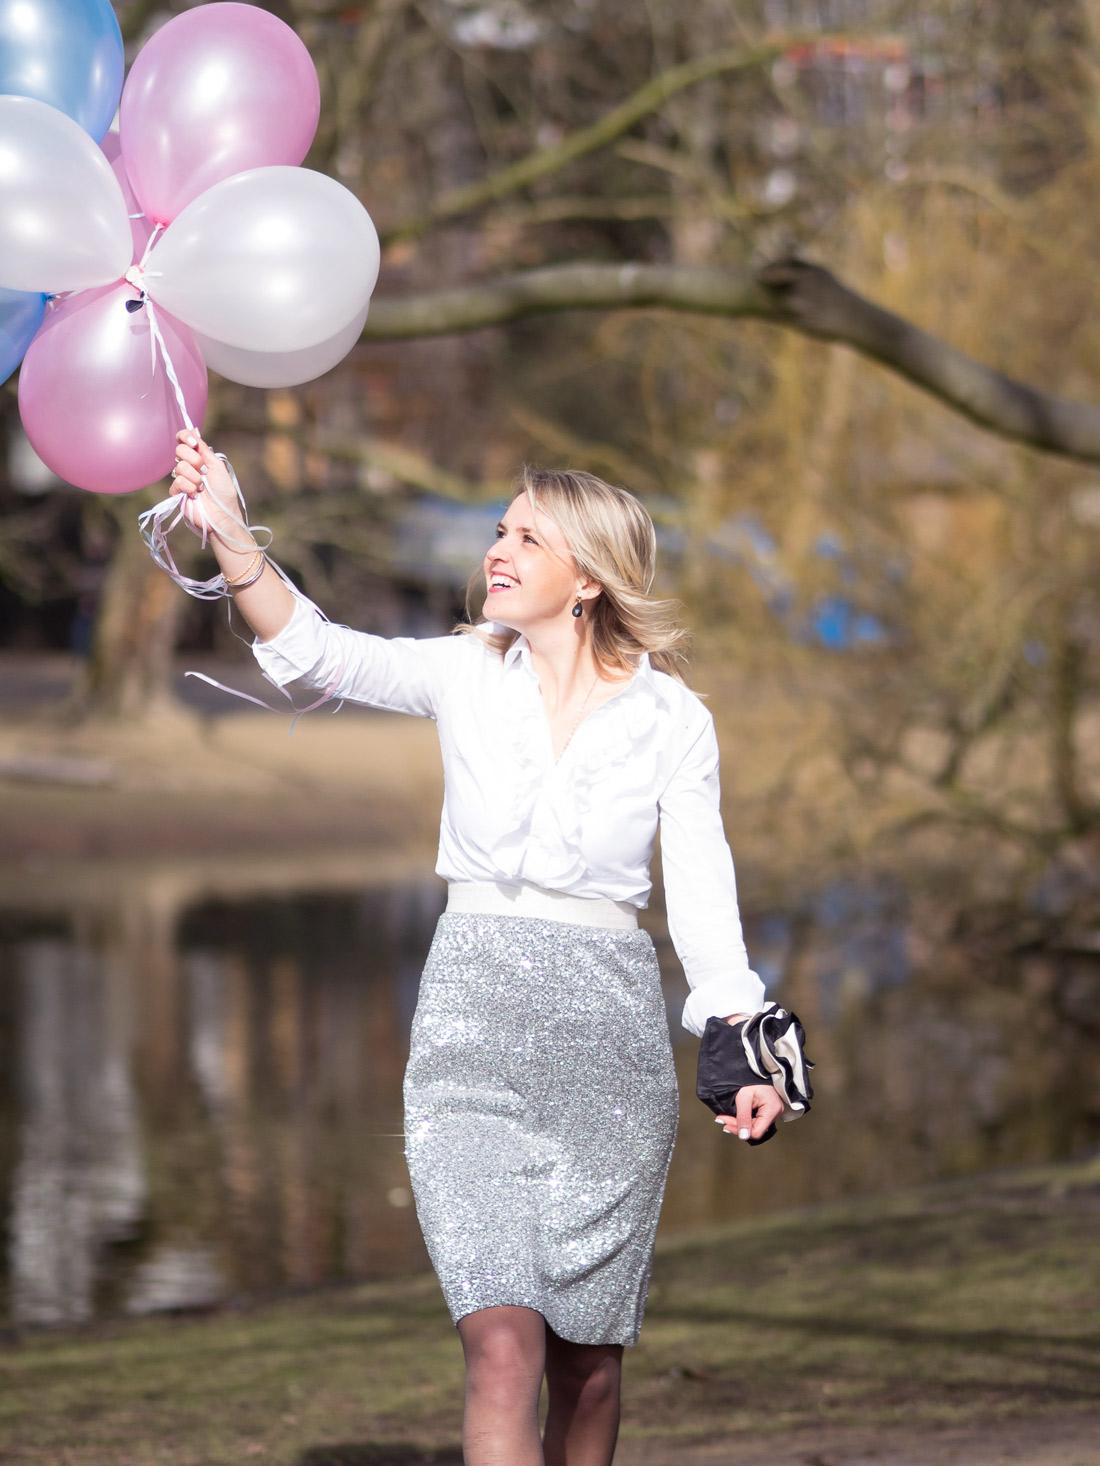 Bag-at-you---Blogger---pregnancy-photography---Marinke-Davelaar